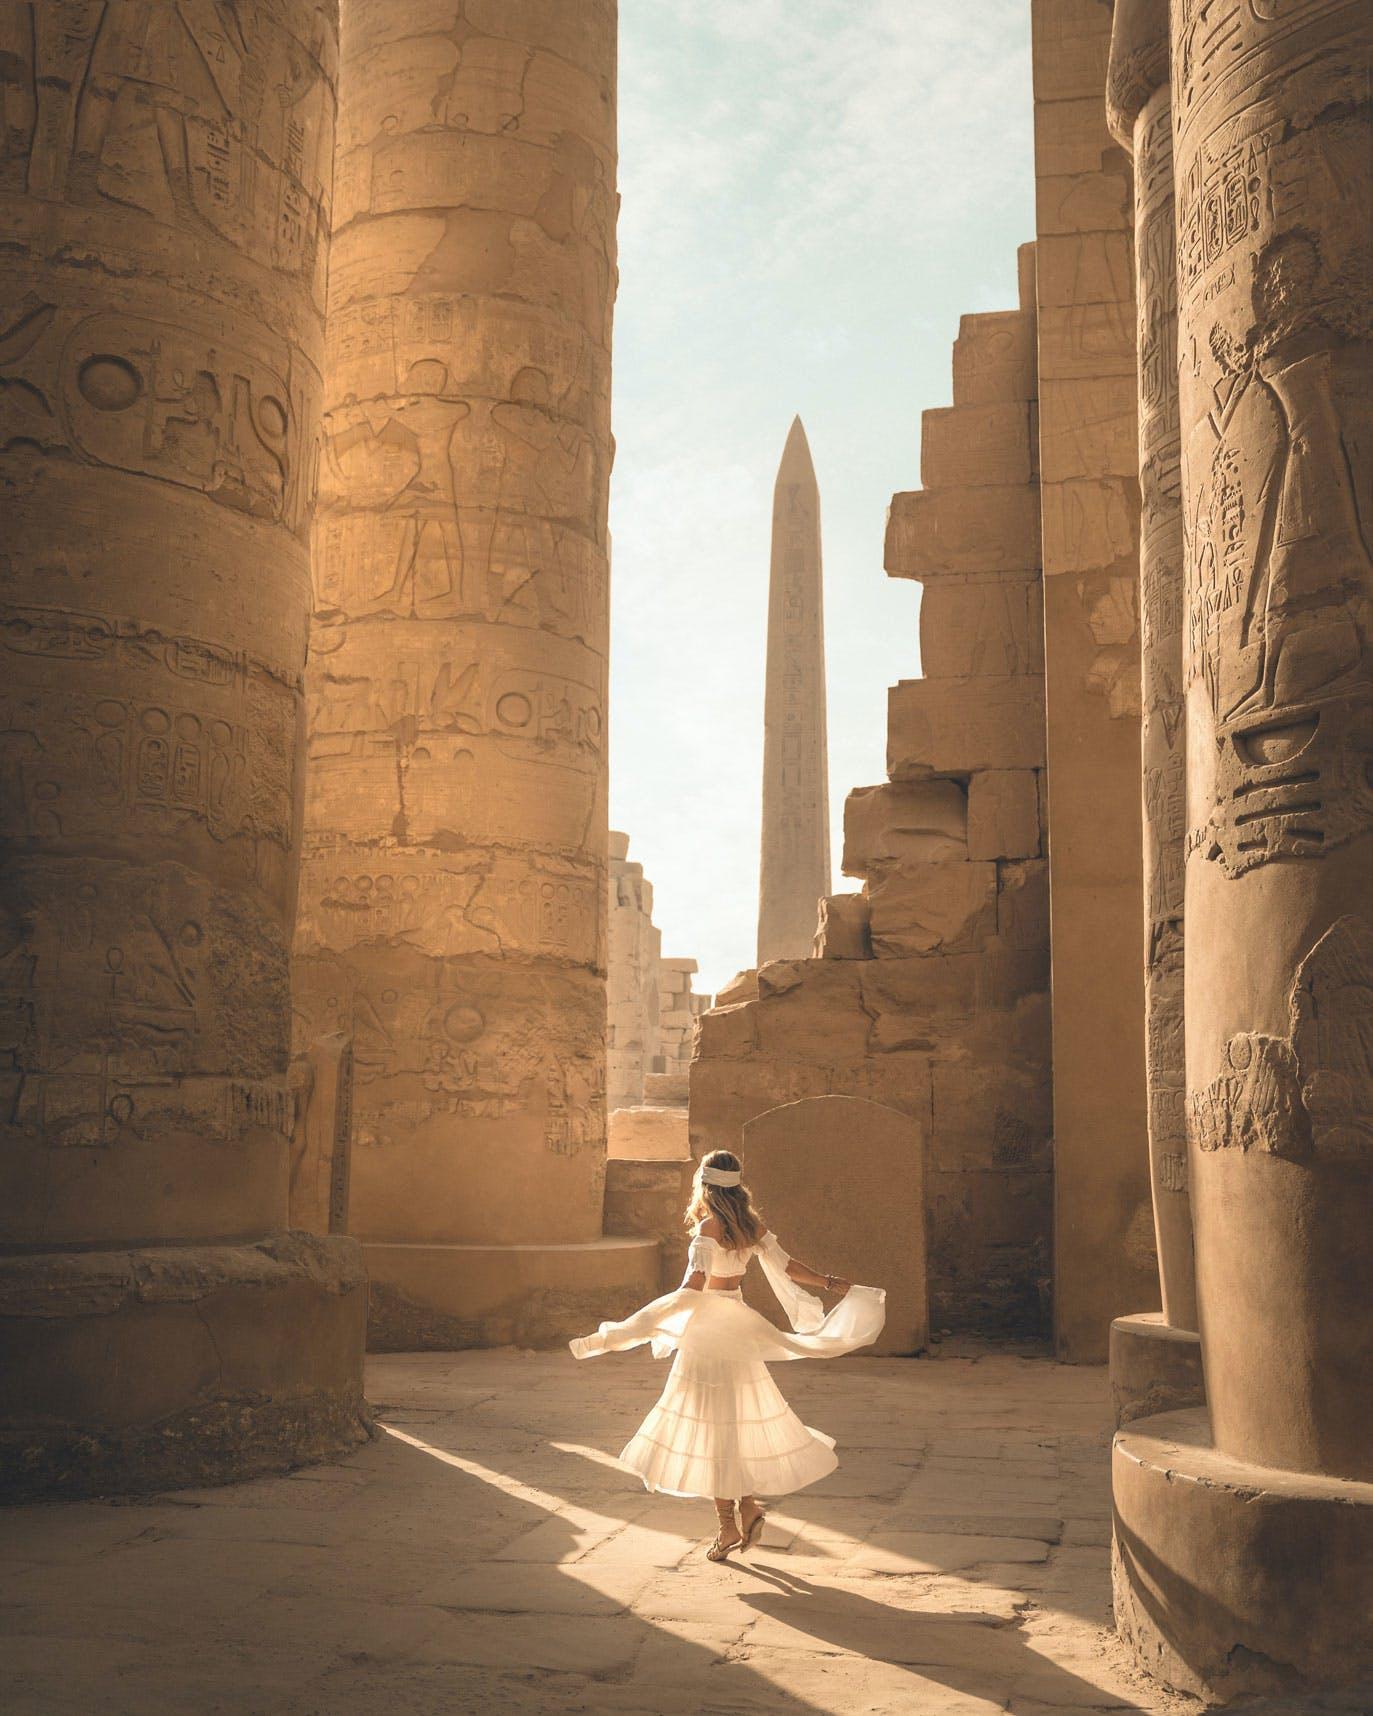 Karnak Temple Hypostyle Hall view of Obelisco de Tutmosis